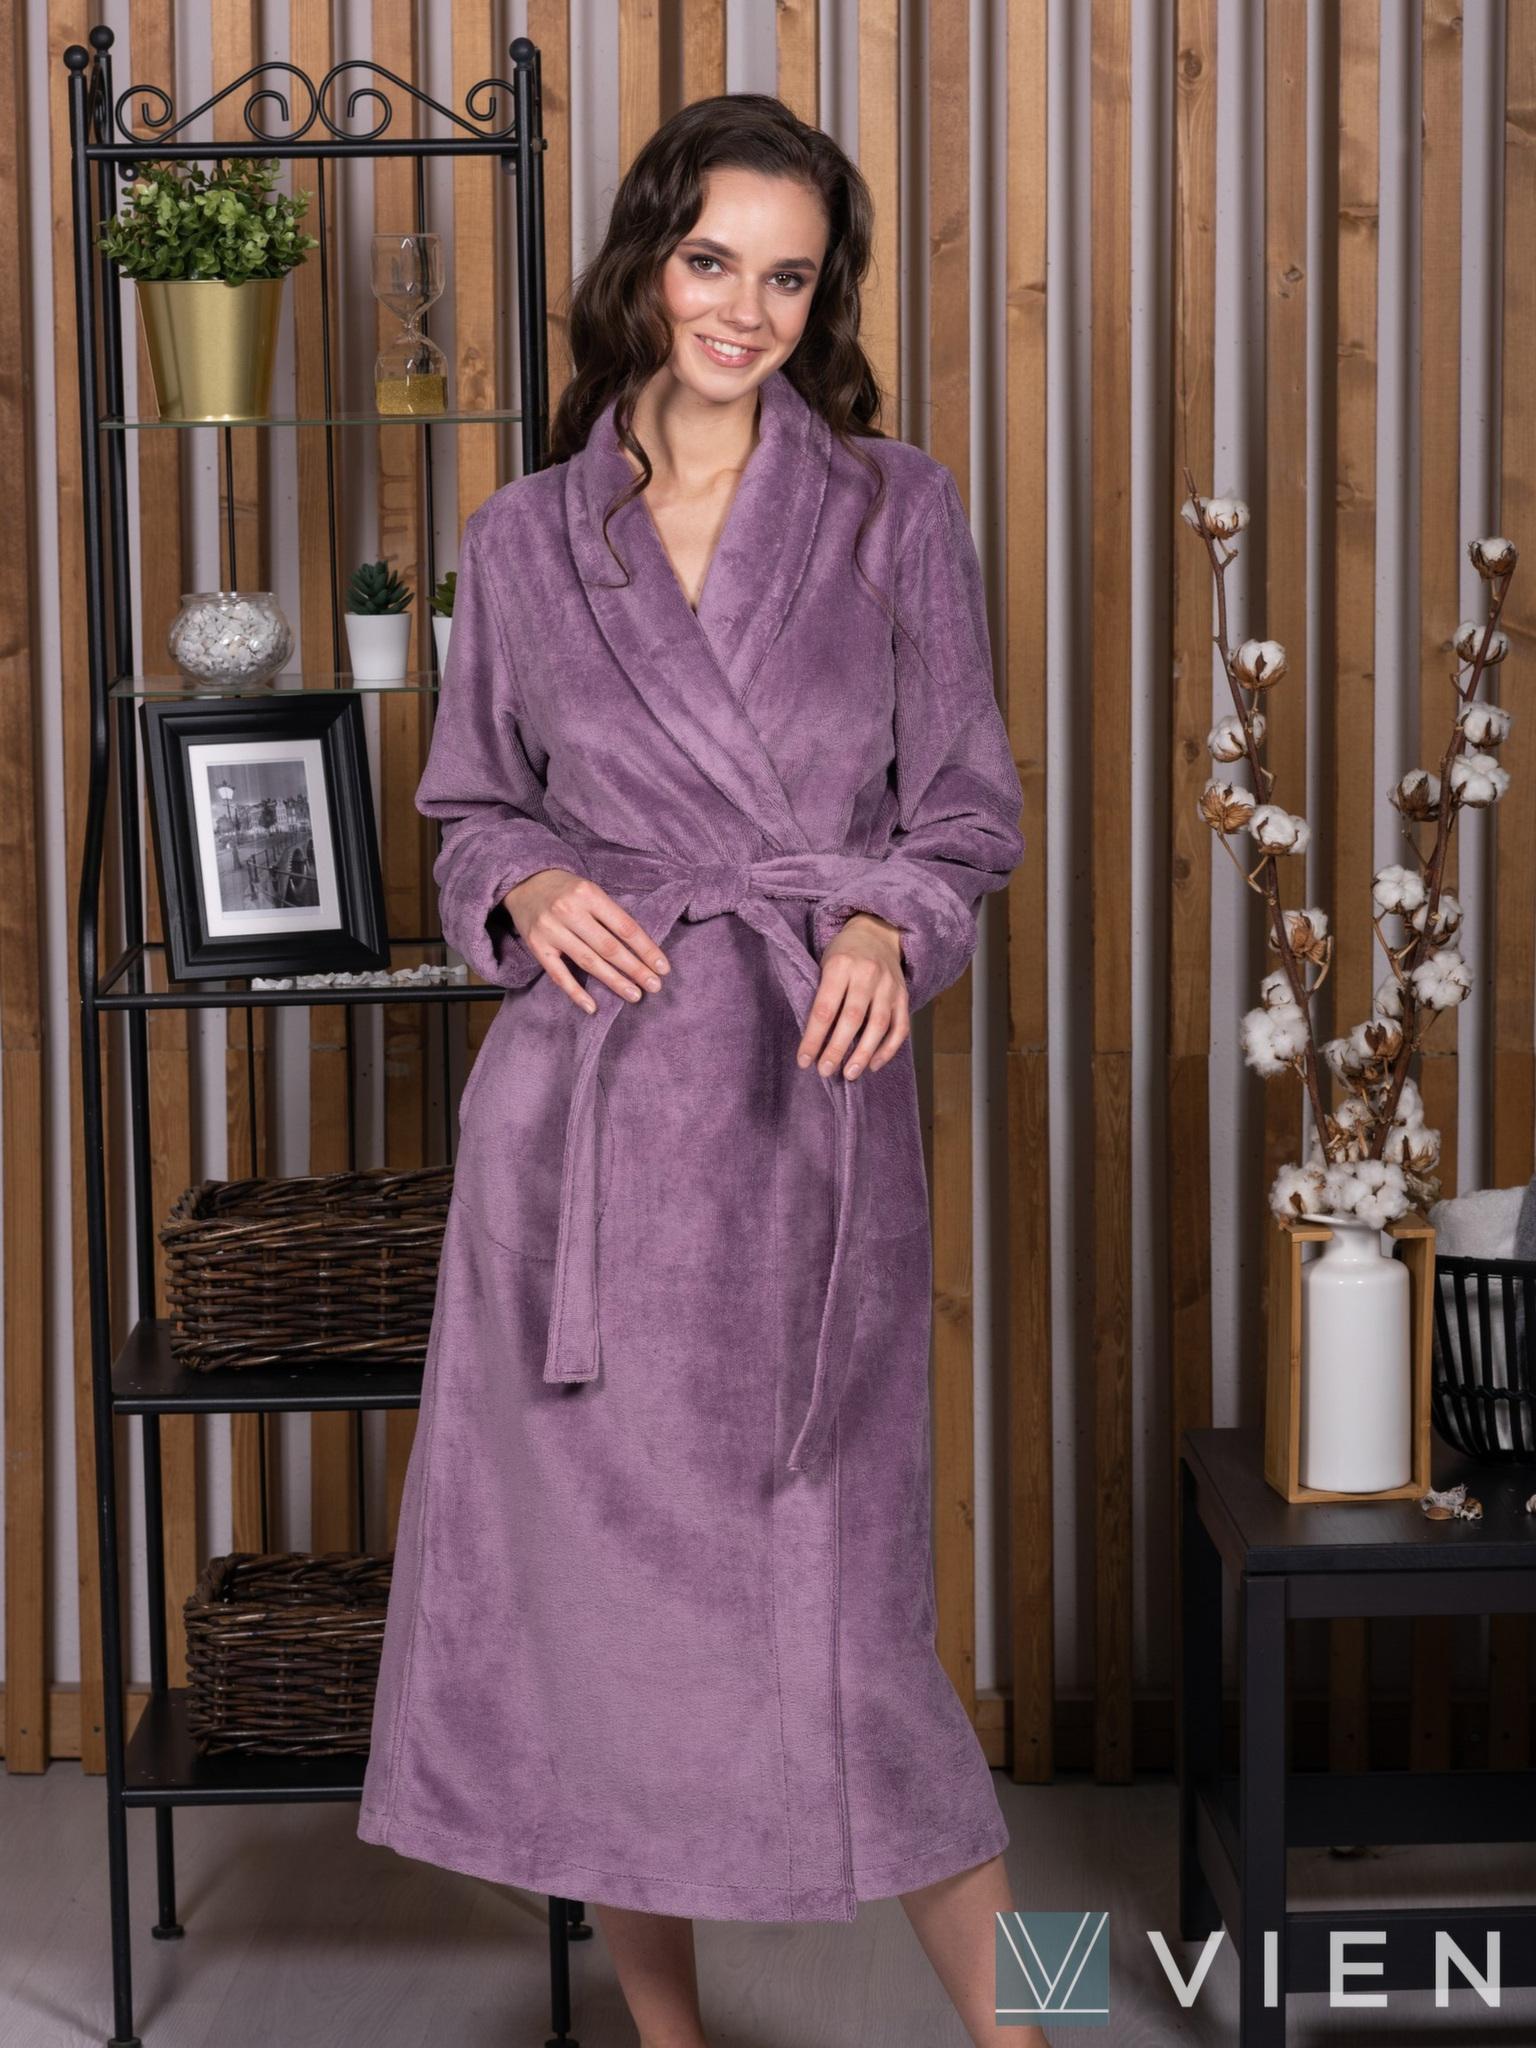 Бамбуковый женский халат 1110 Delal сиреневый Wien